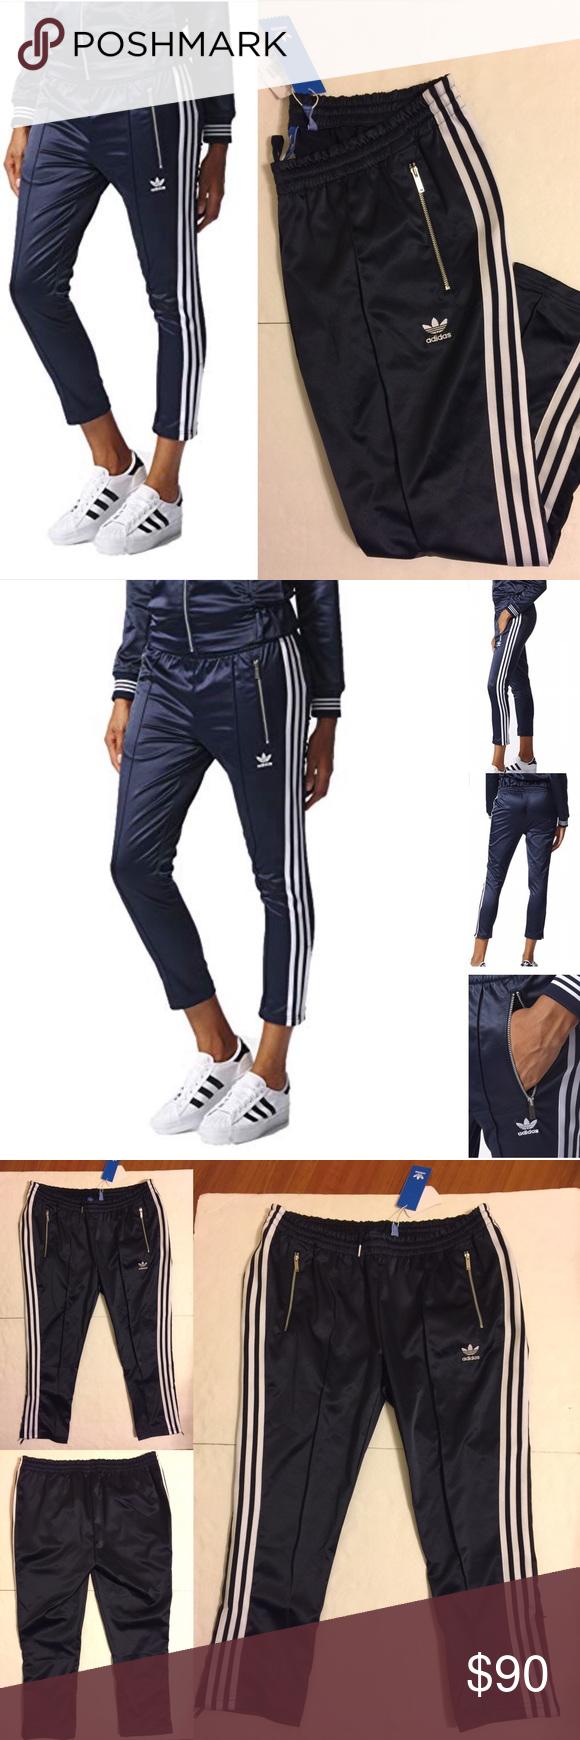 NWT Adidas Originals Pants Size XL New with tags!! Adidas